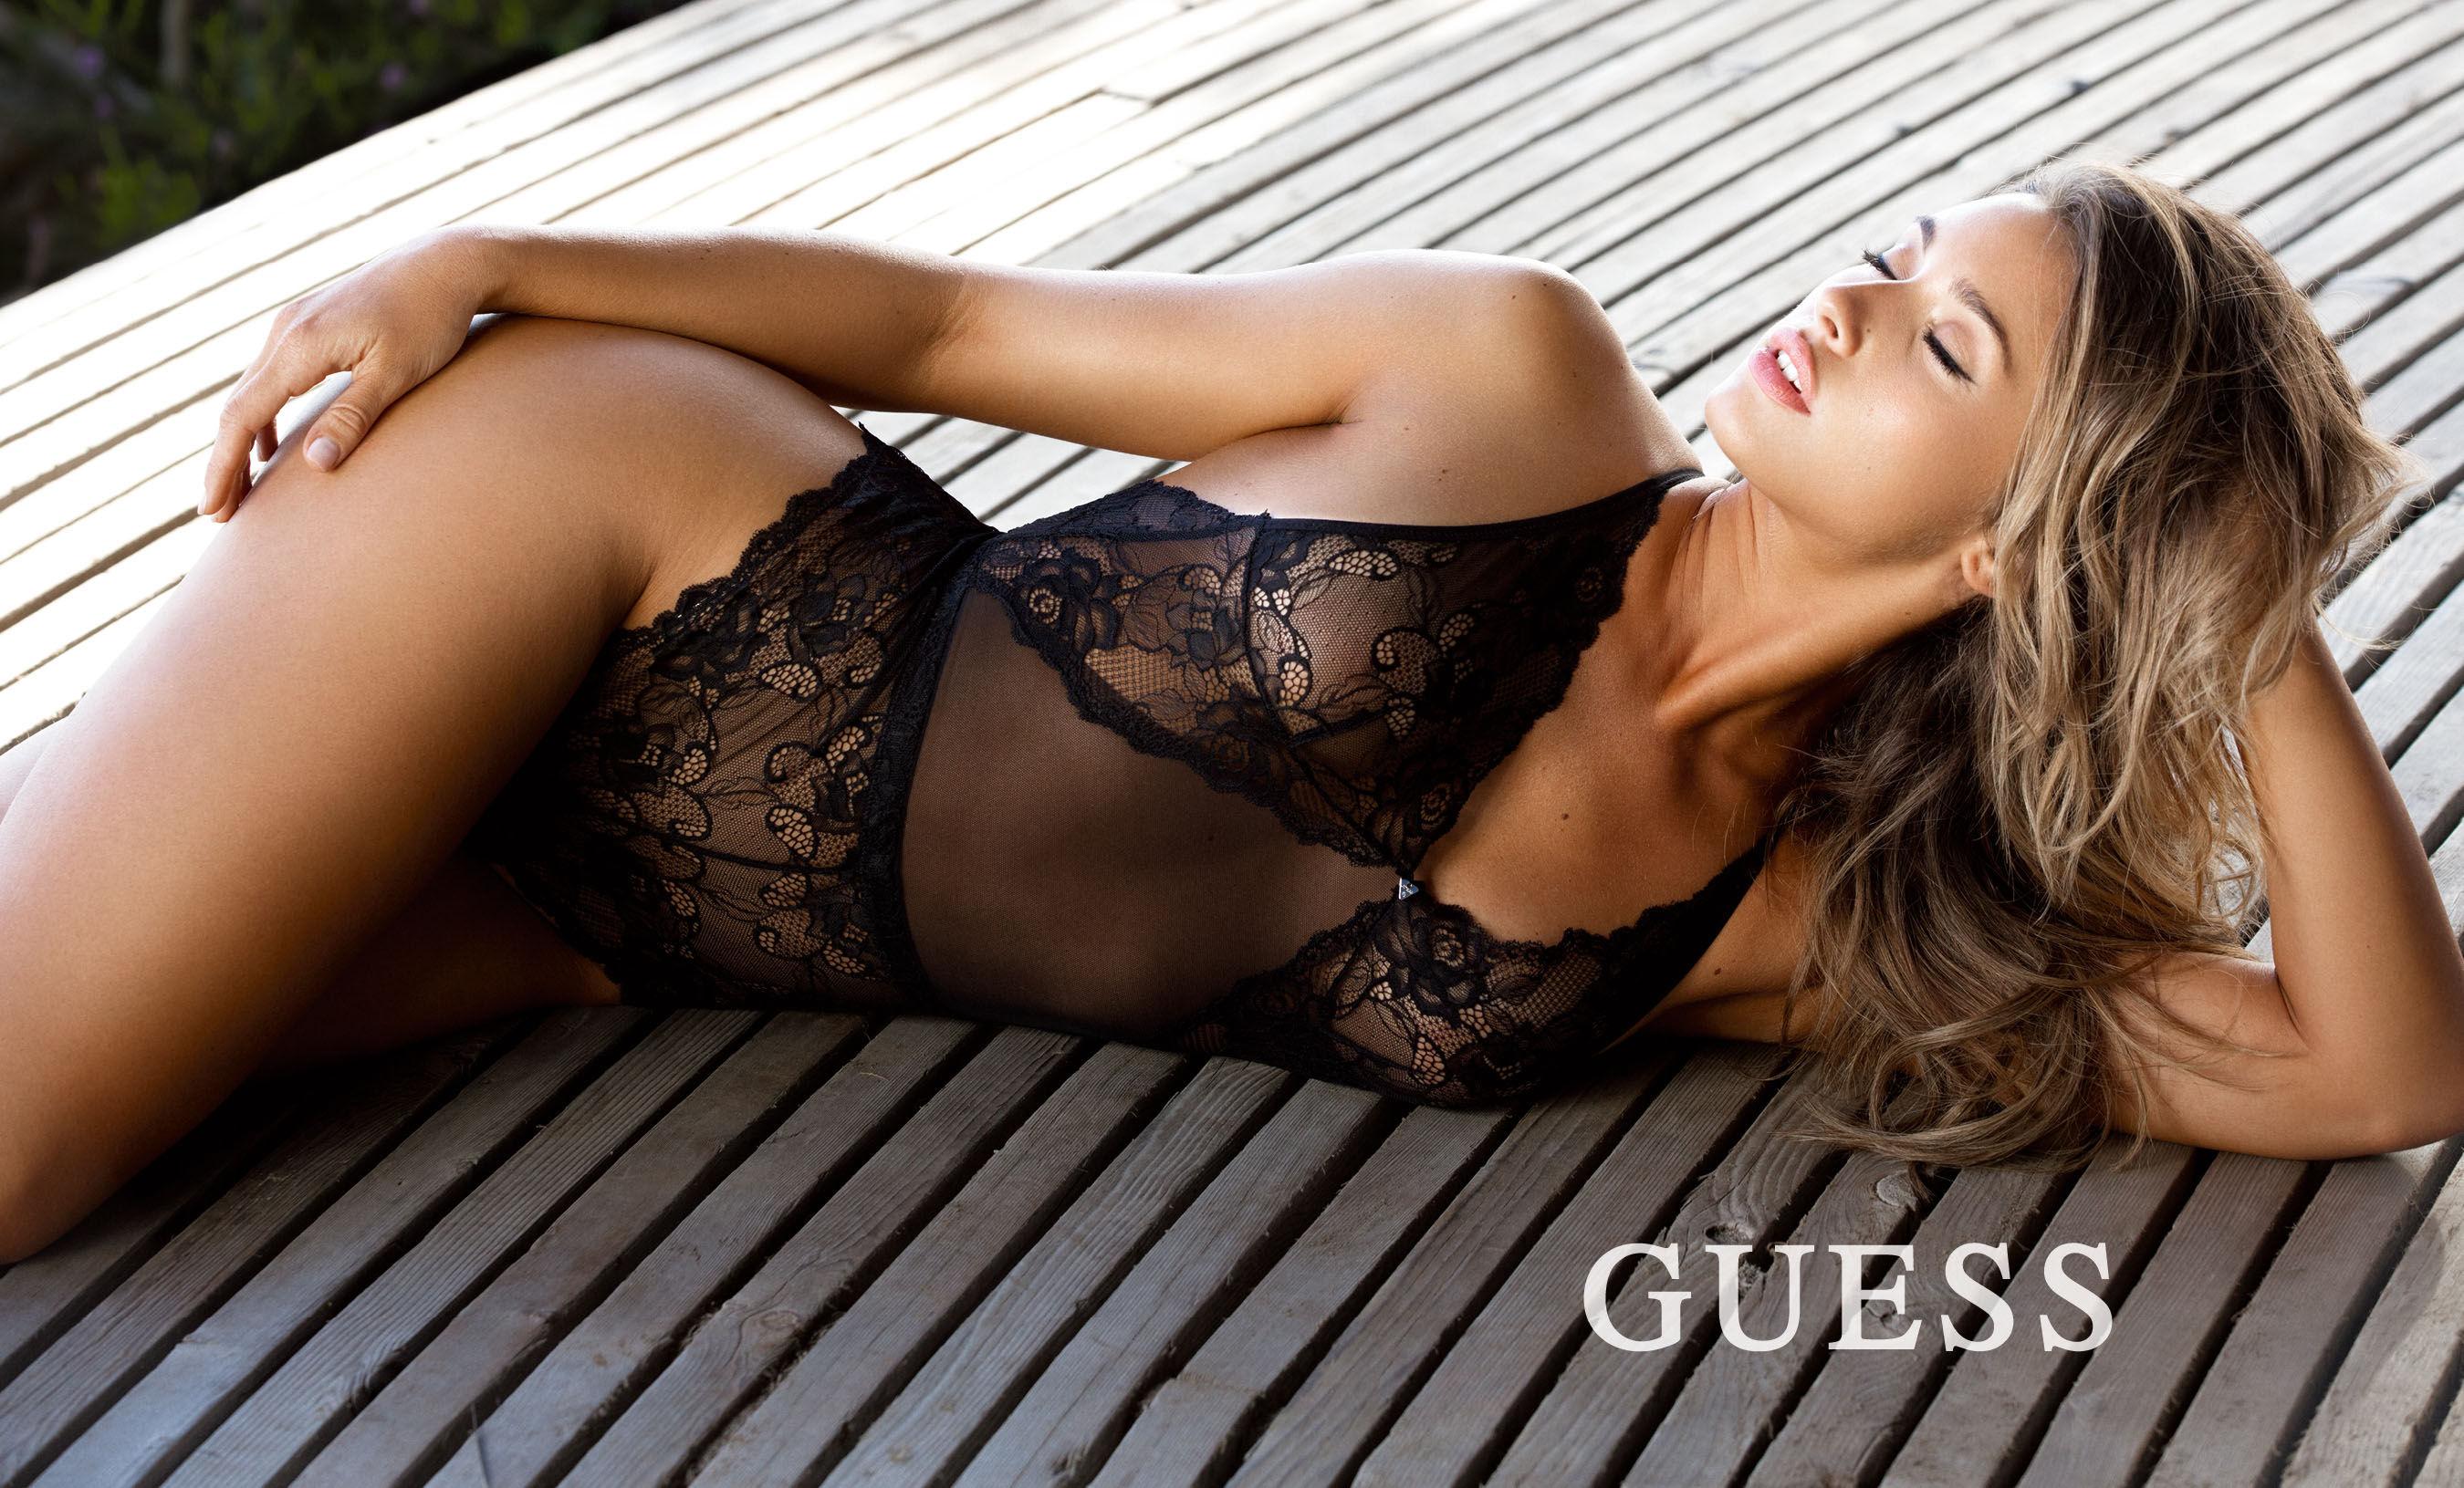 Watch Gabriela giovanardi naked instagram model video